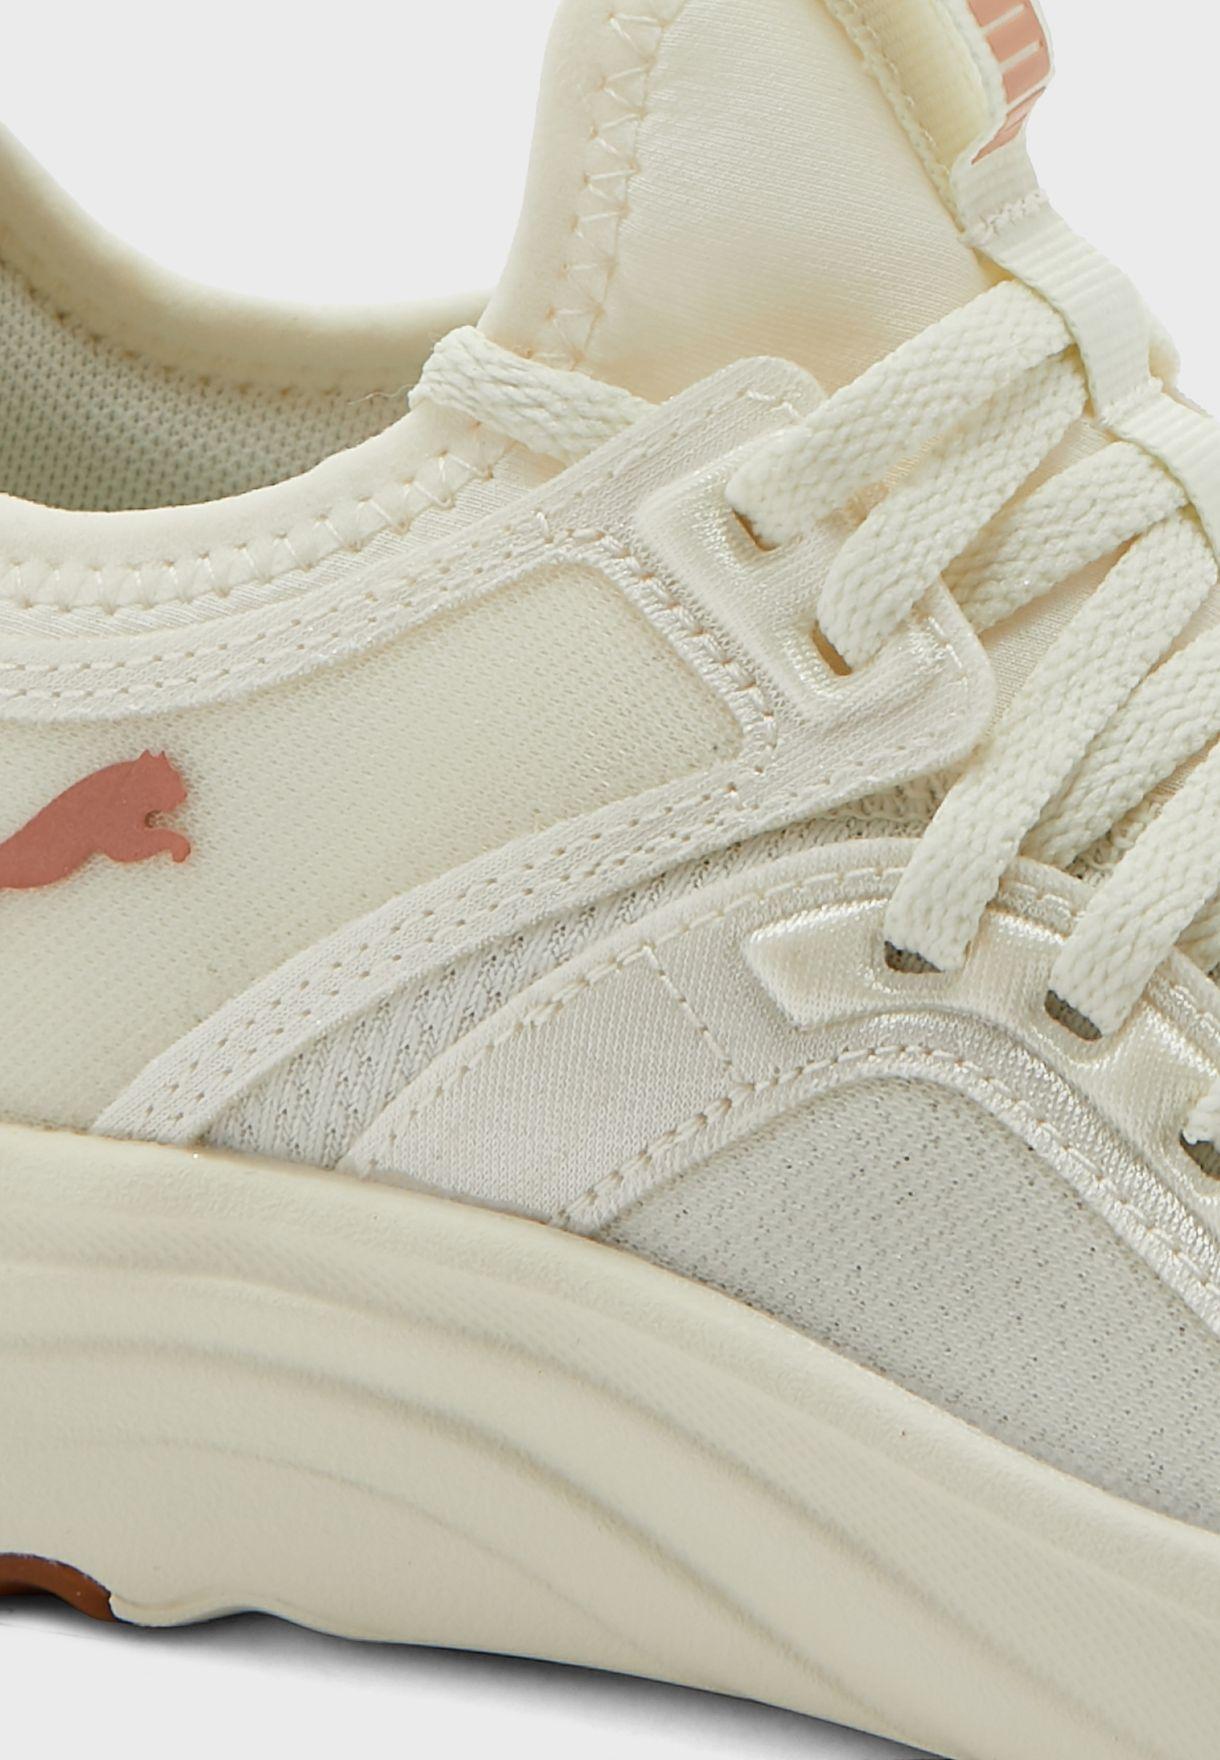 Softride Sophia women shoes